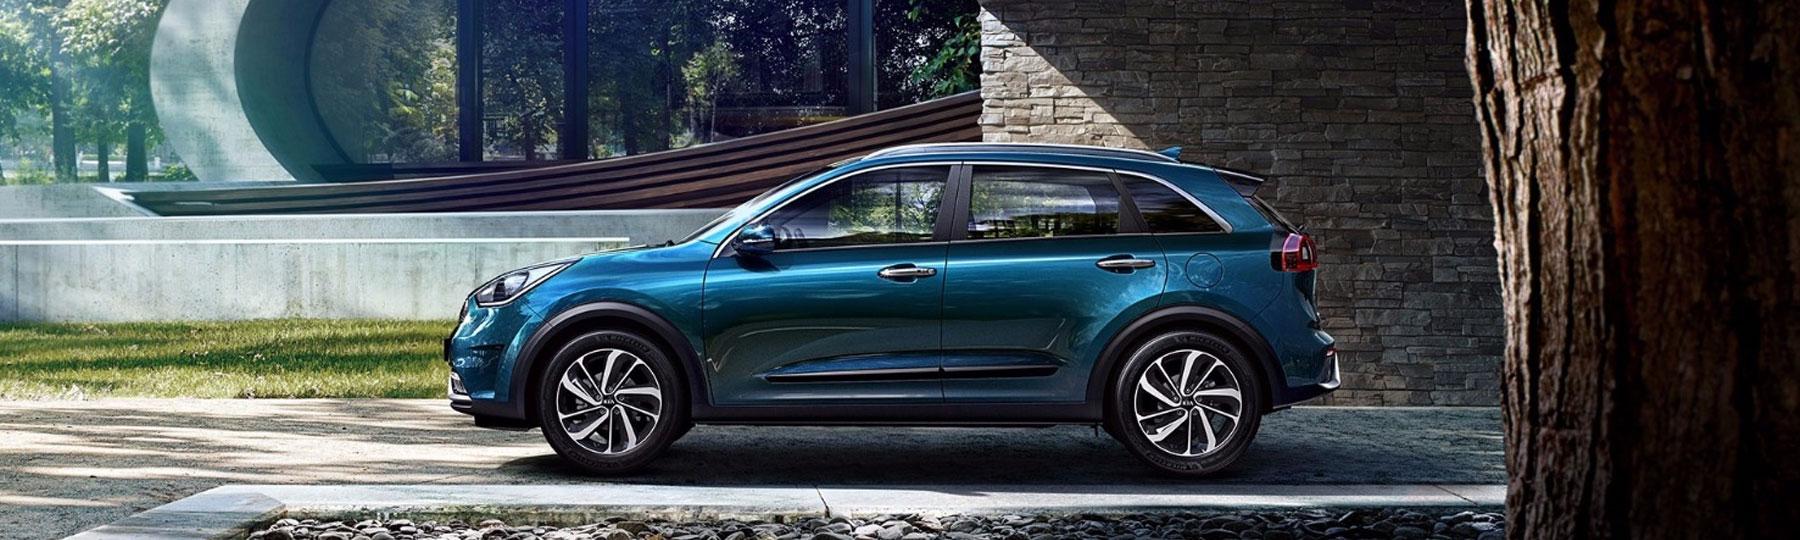 Kia Niro Self-Charging Hybrid New Car Offer